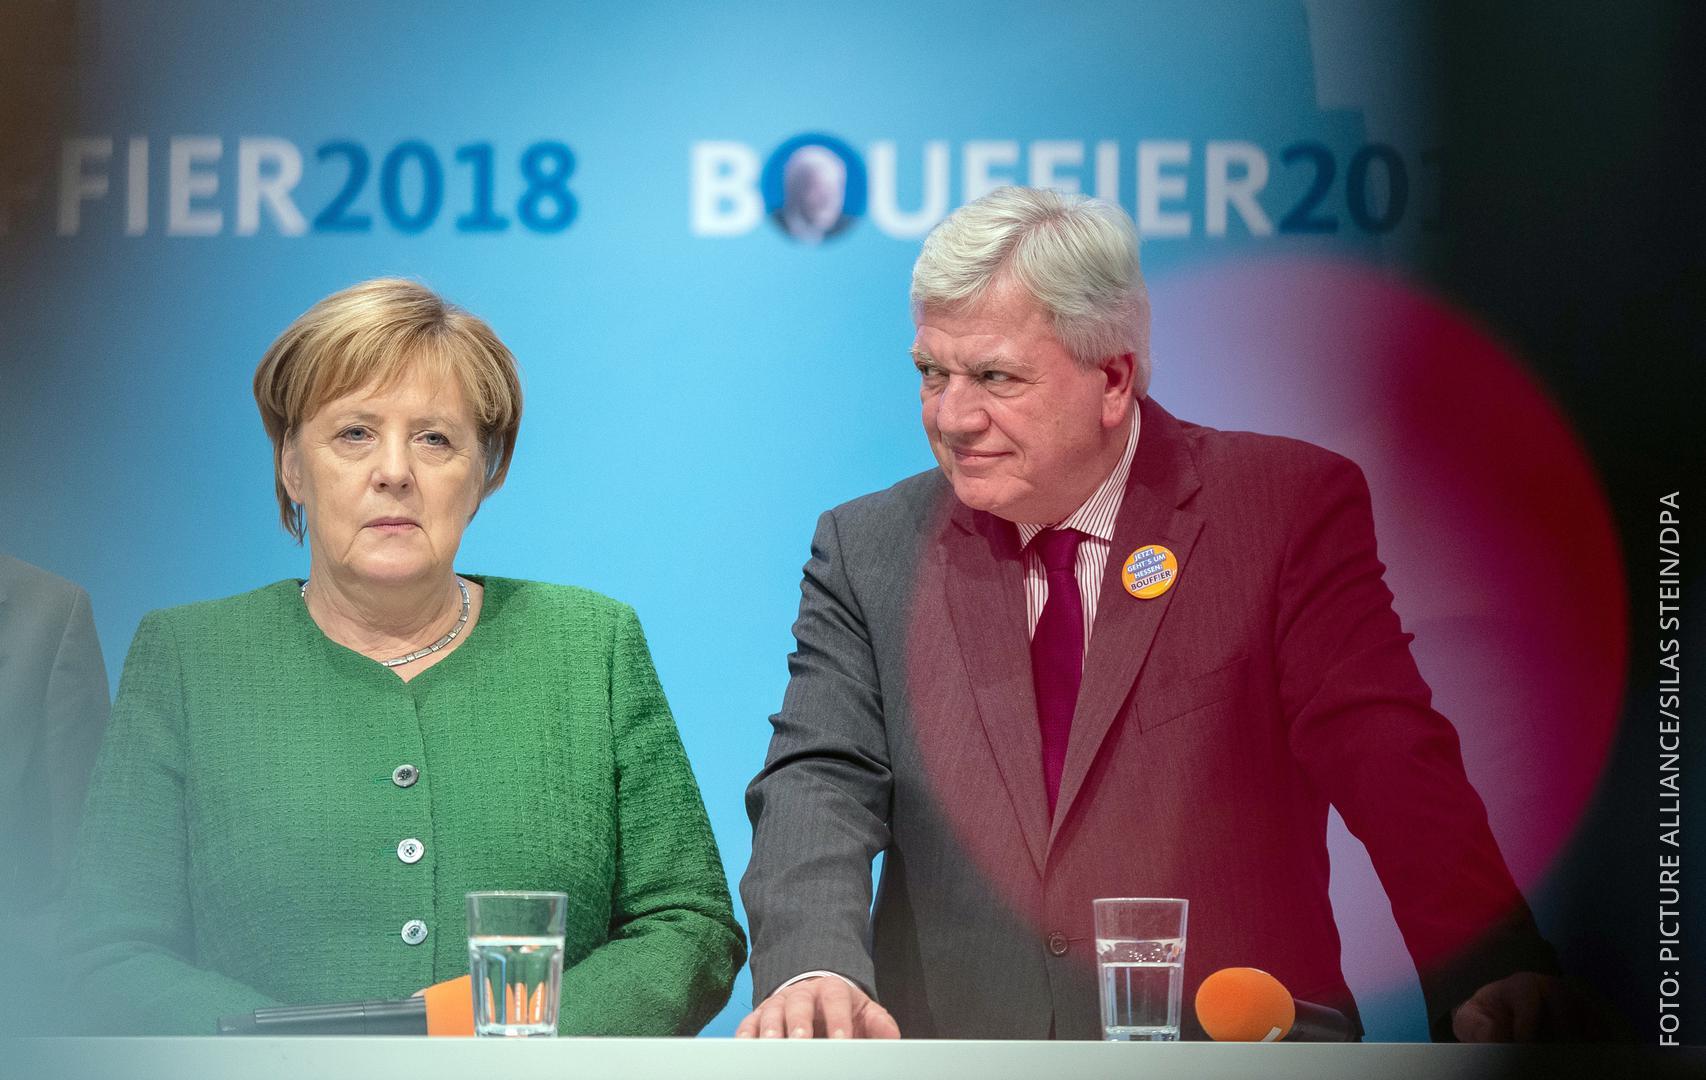 Merkel Bouffier Wahlkampfauftritt